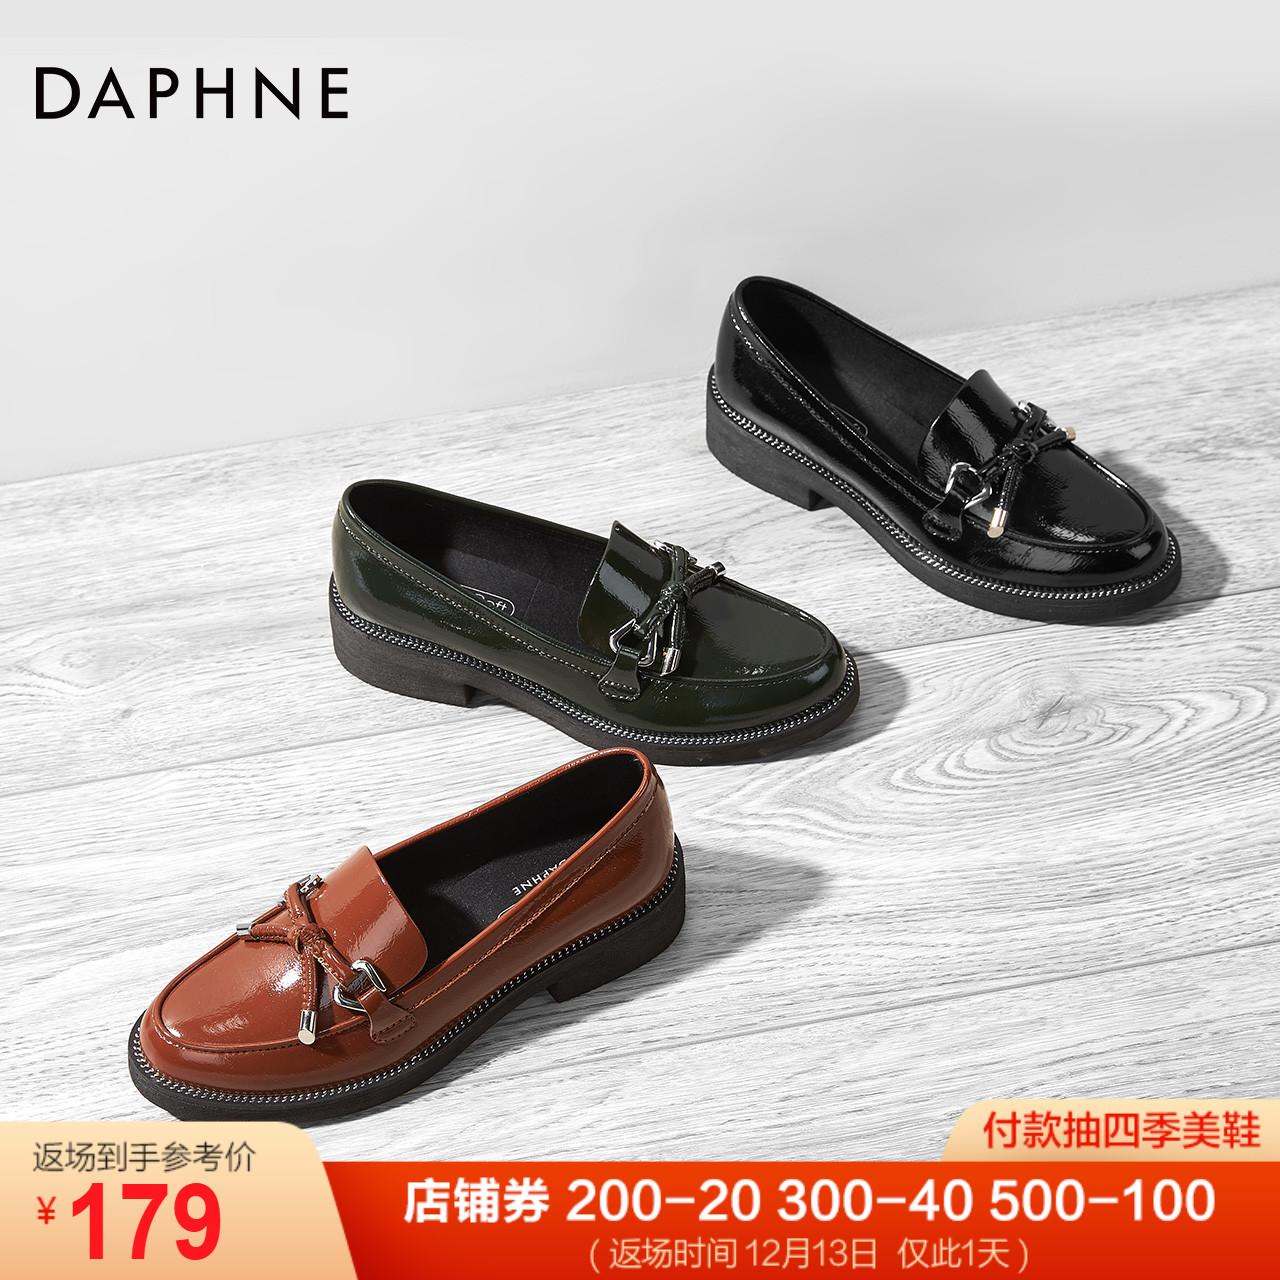 Daphne/达芙妮2018秋新款时尚漆面舒适休闲乐福鞋蝴蝶结单鞋女